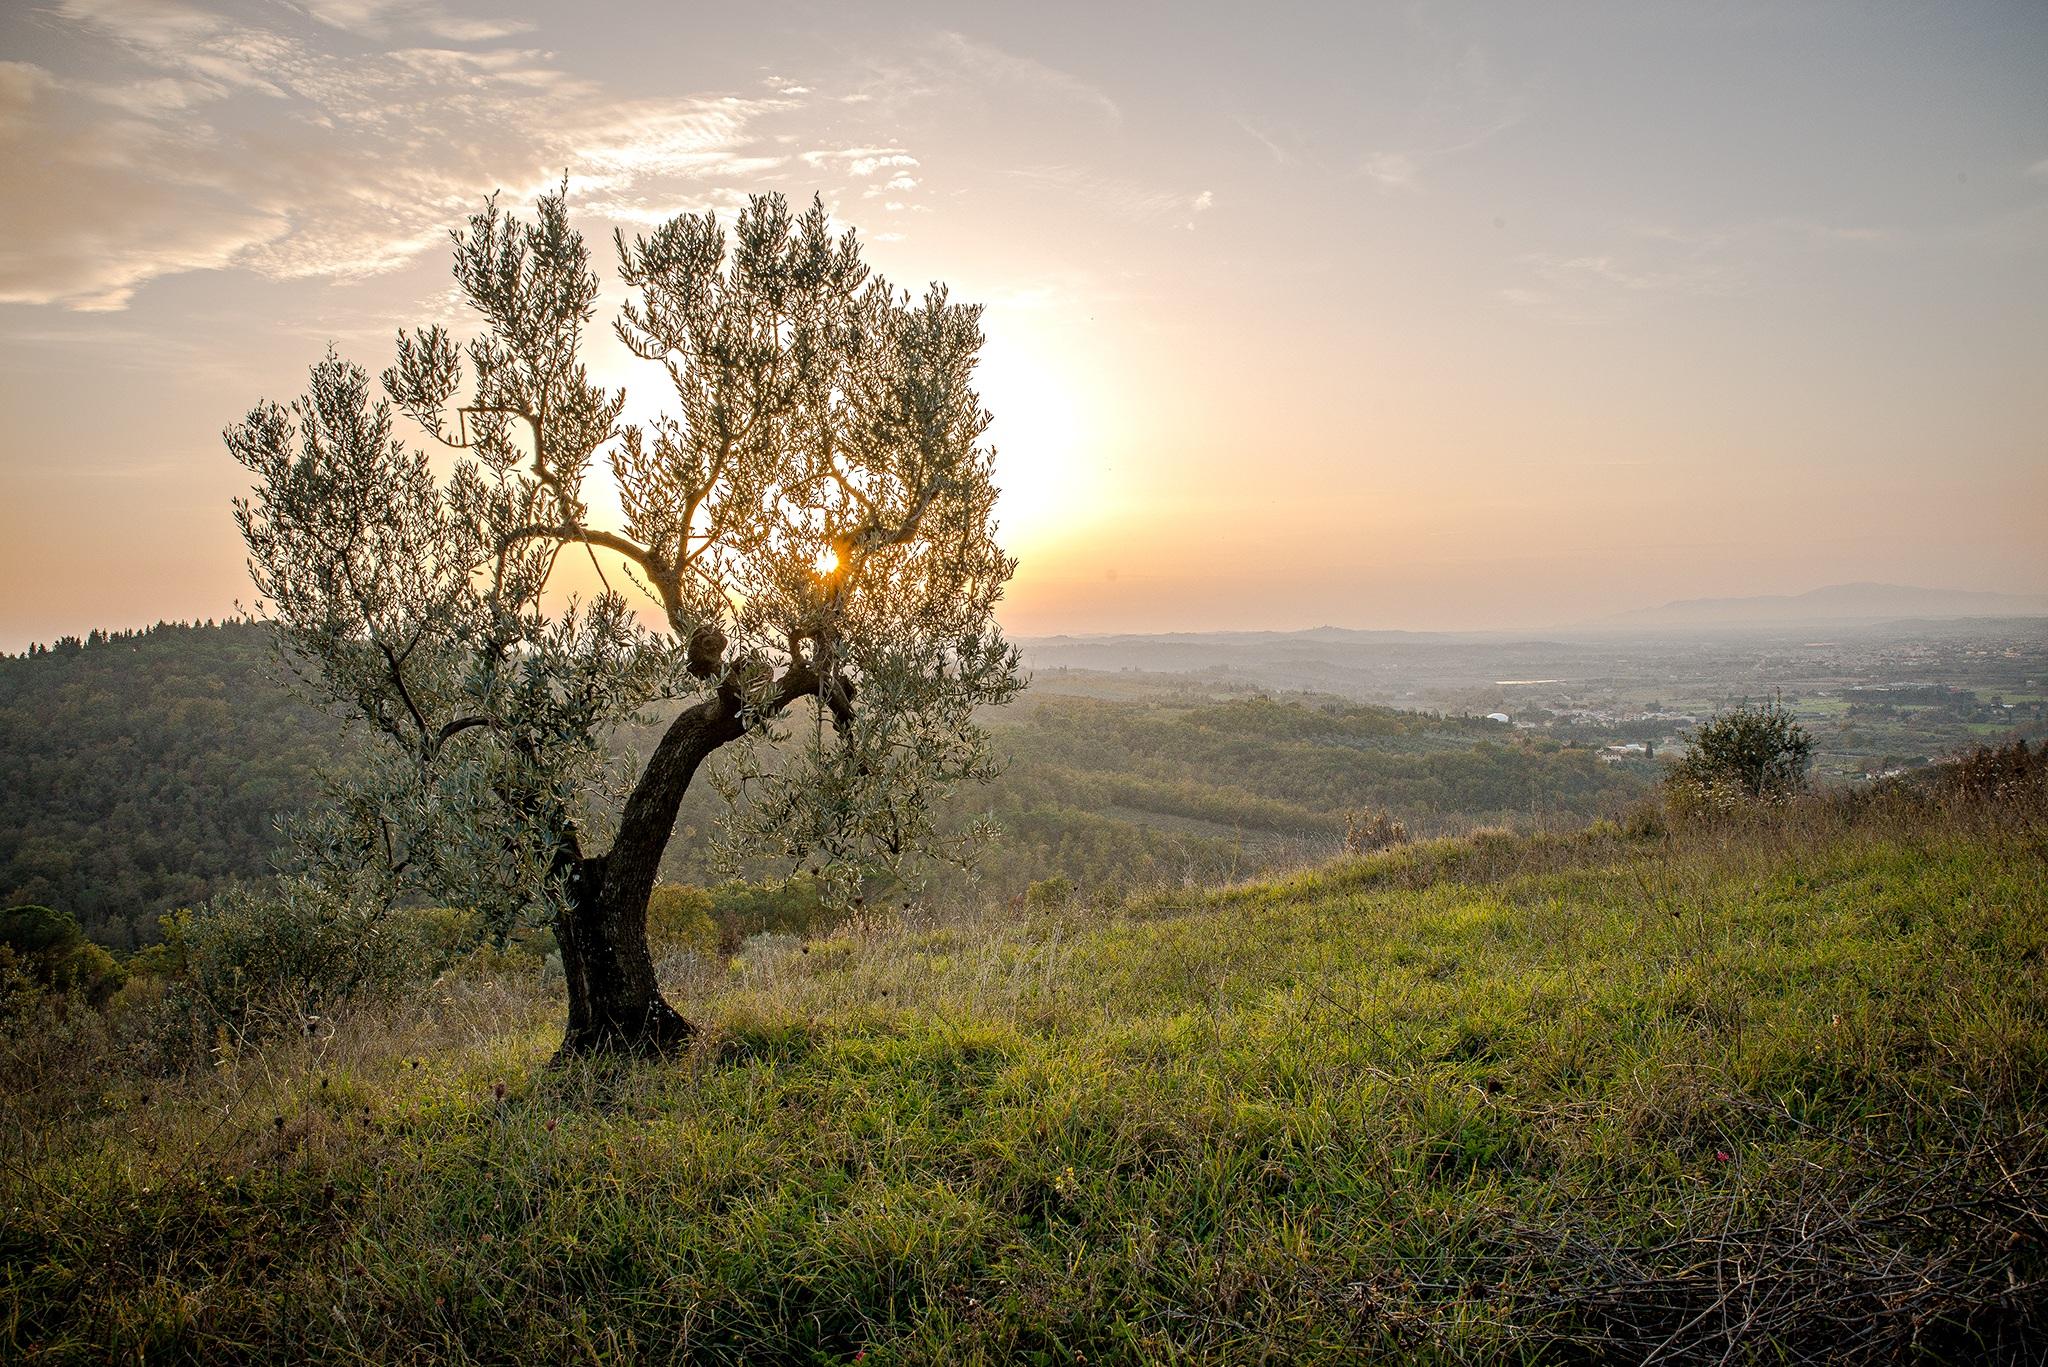 Free Images : landscape, tree, nature, grass, horizon, wilderness ...